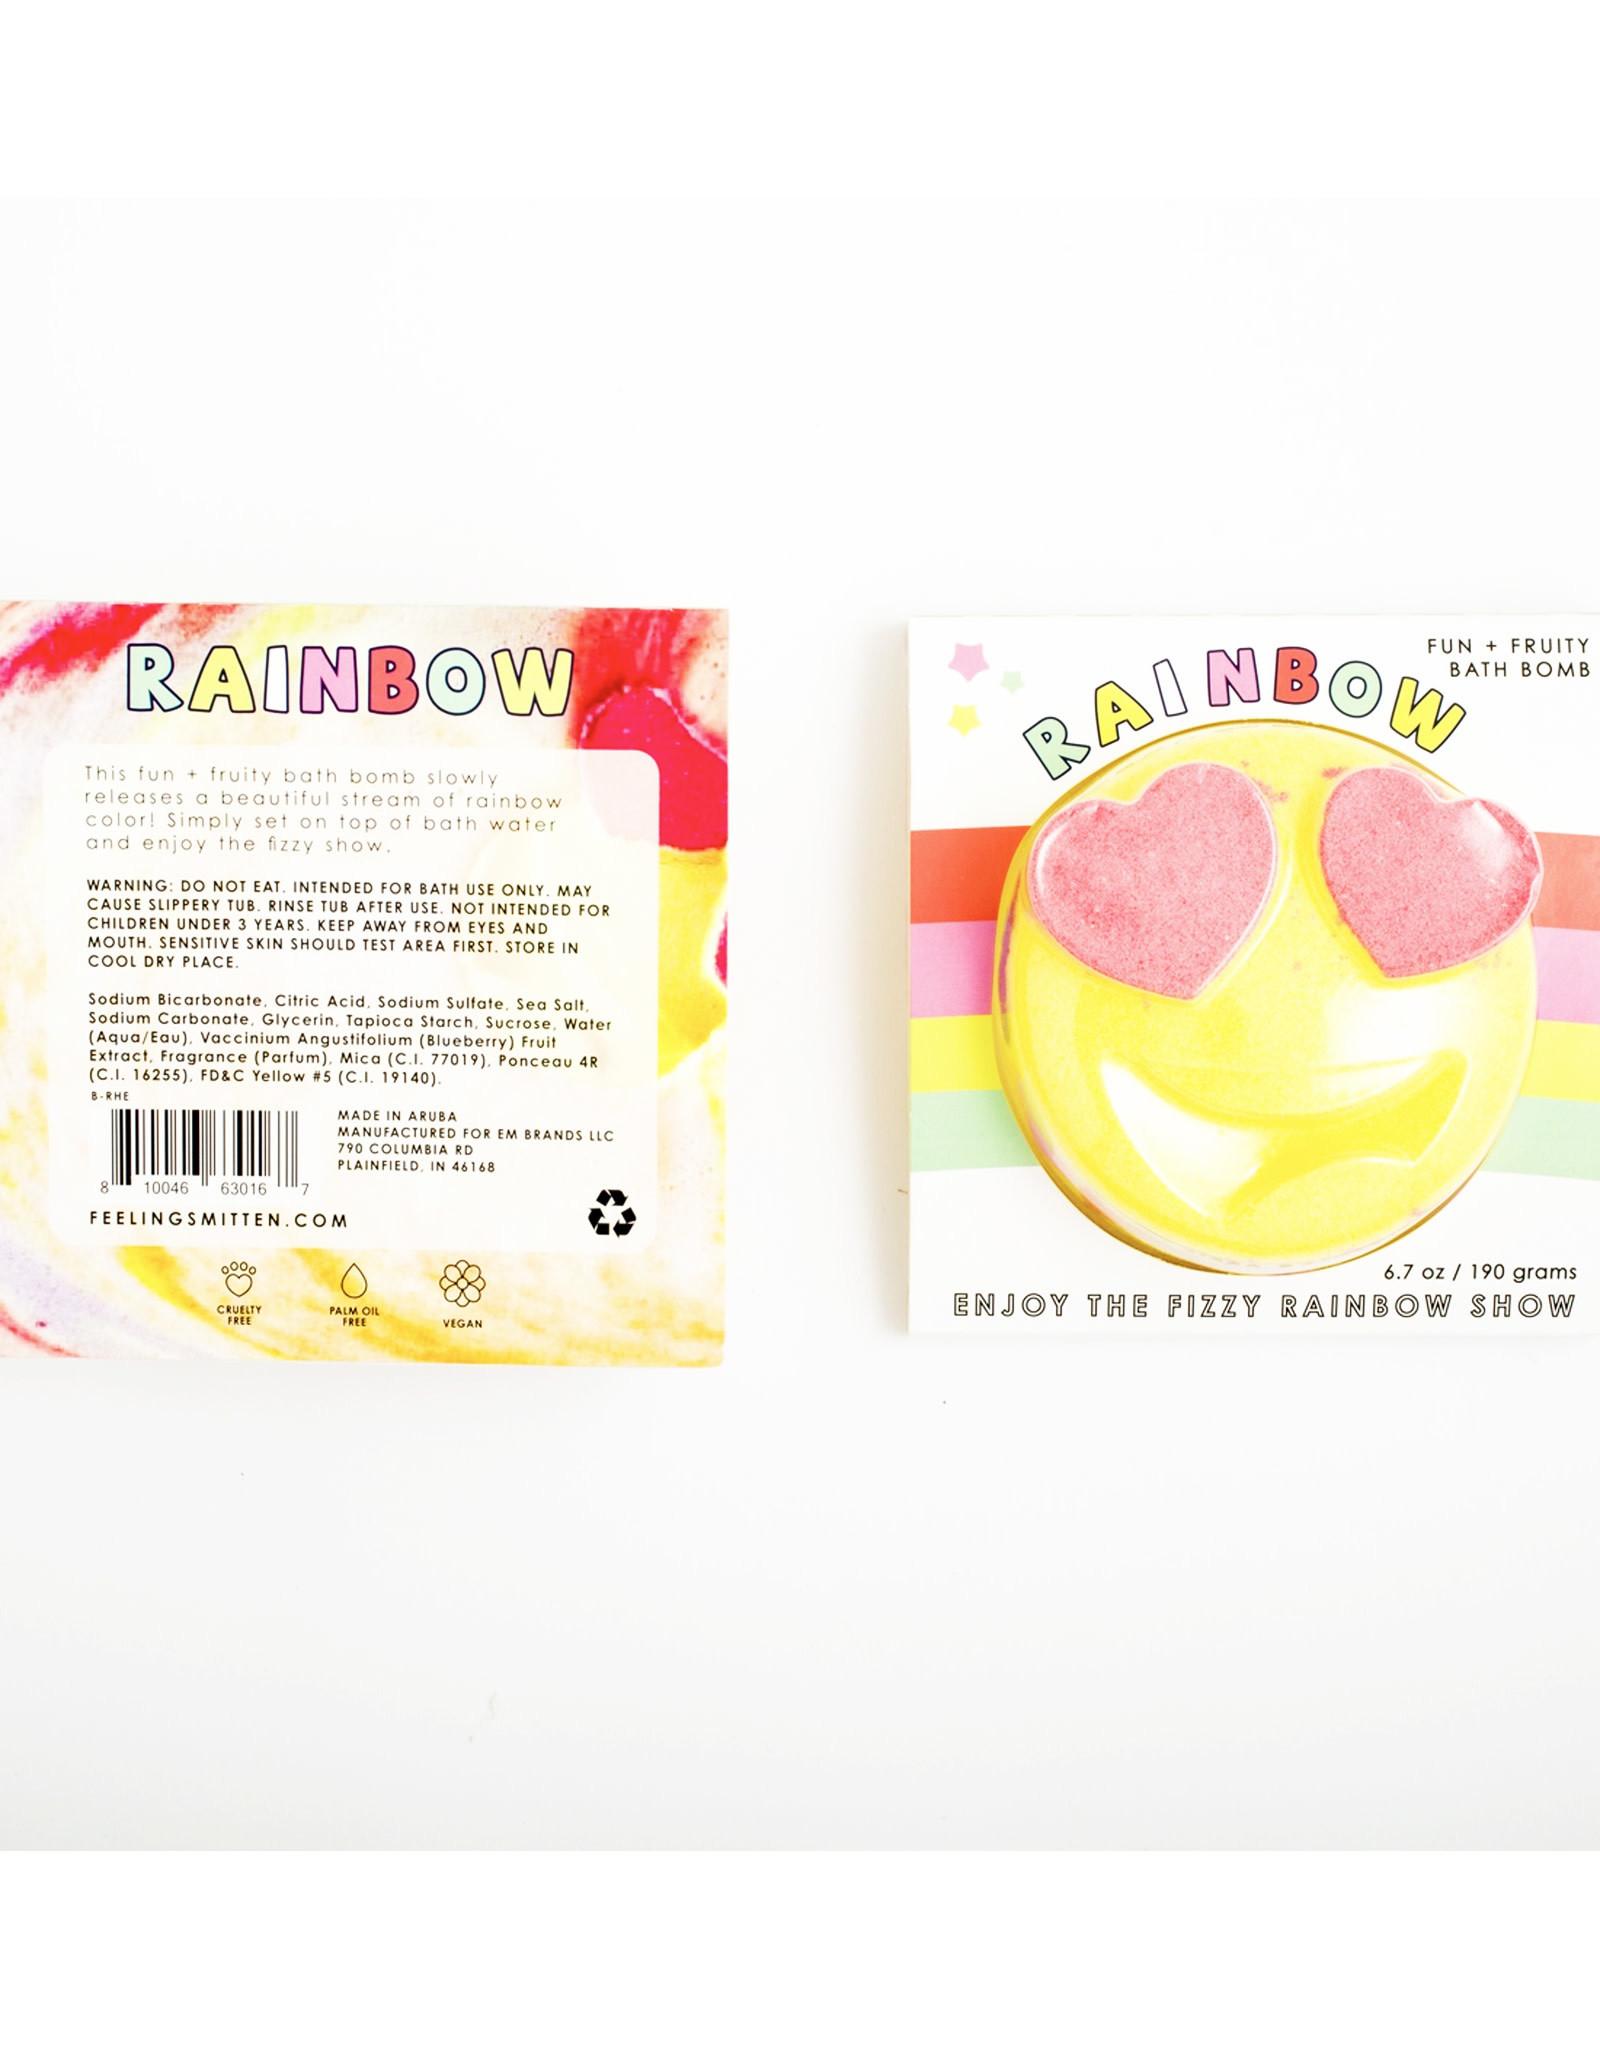 Feeling Smitten Fun + Fruity Rainbow Emoji Bath Bomb